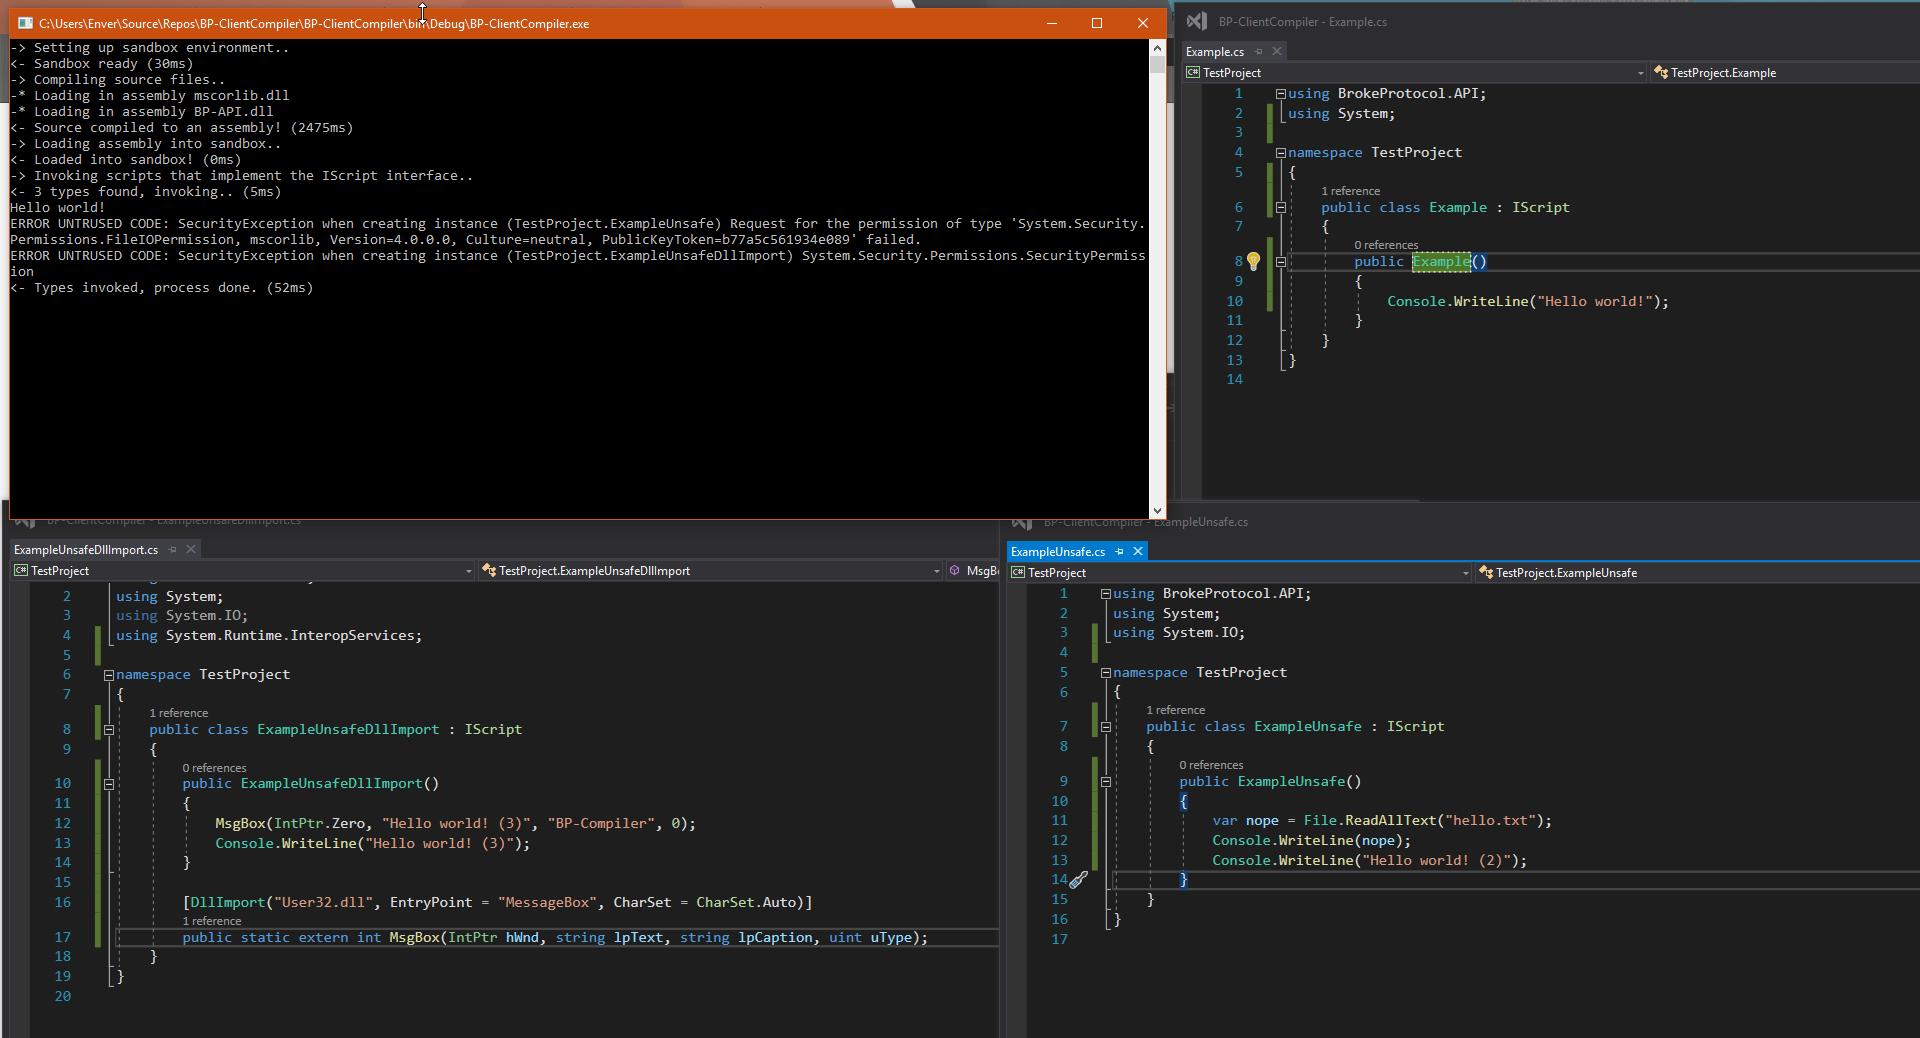 ClientCompiler